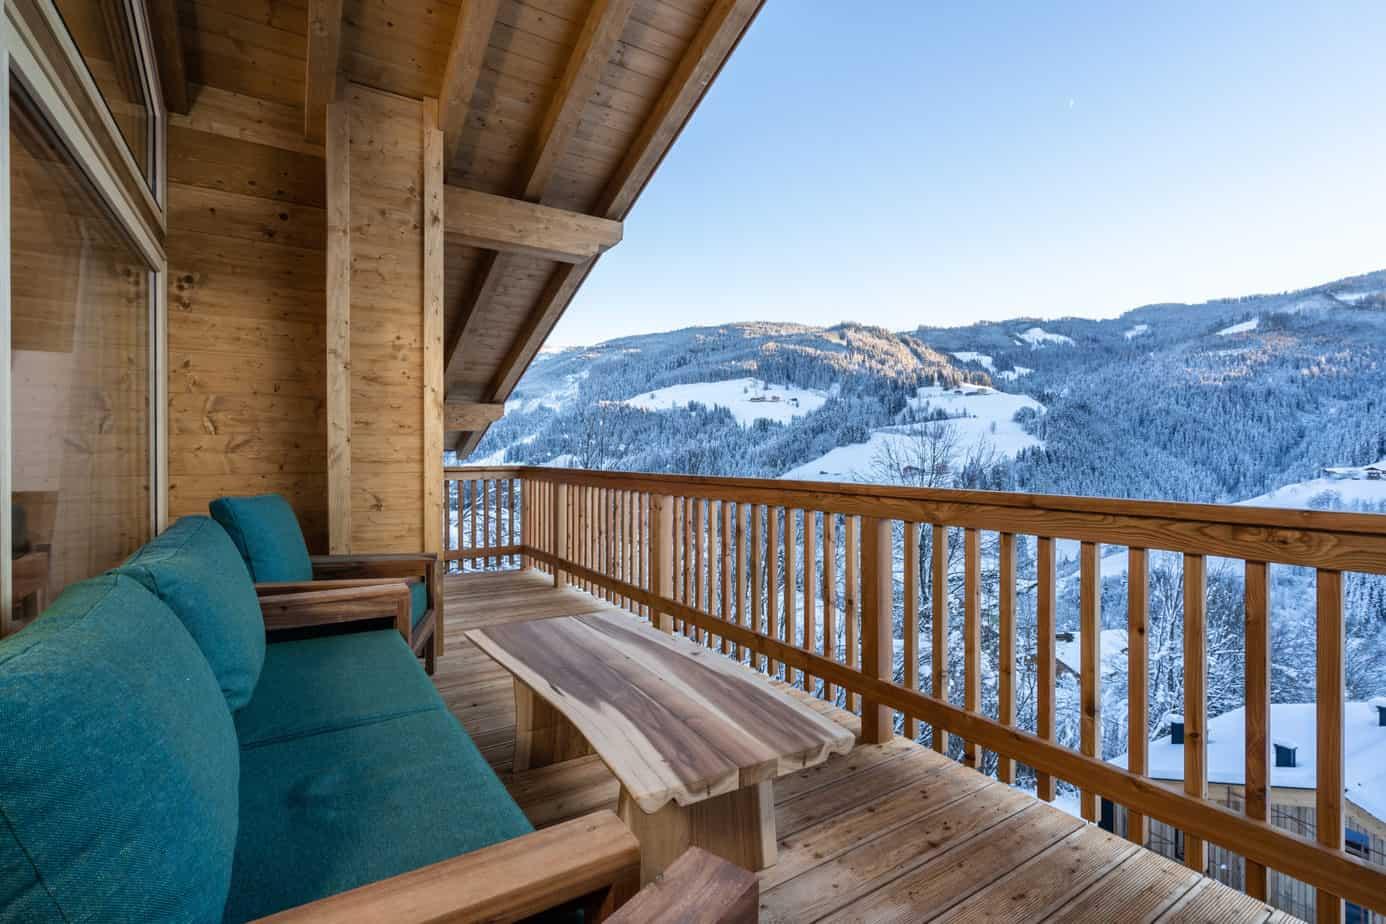 Uitzicht vanuit luxe lodge in het besneeuwde Mühlbach am Hochkönig